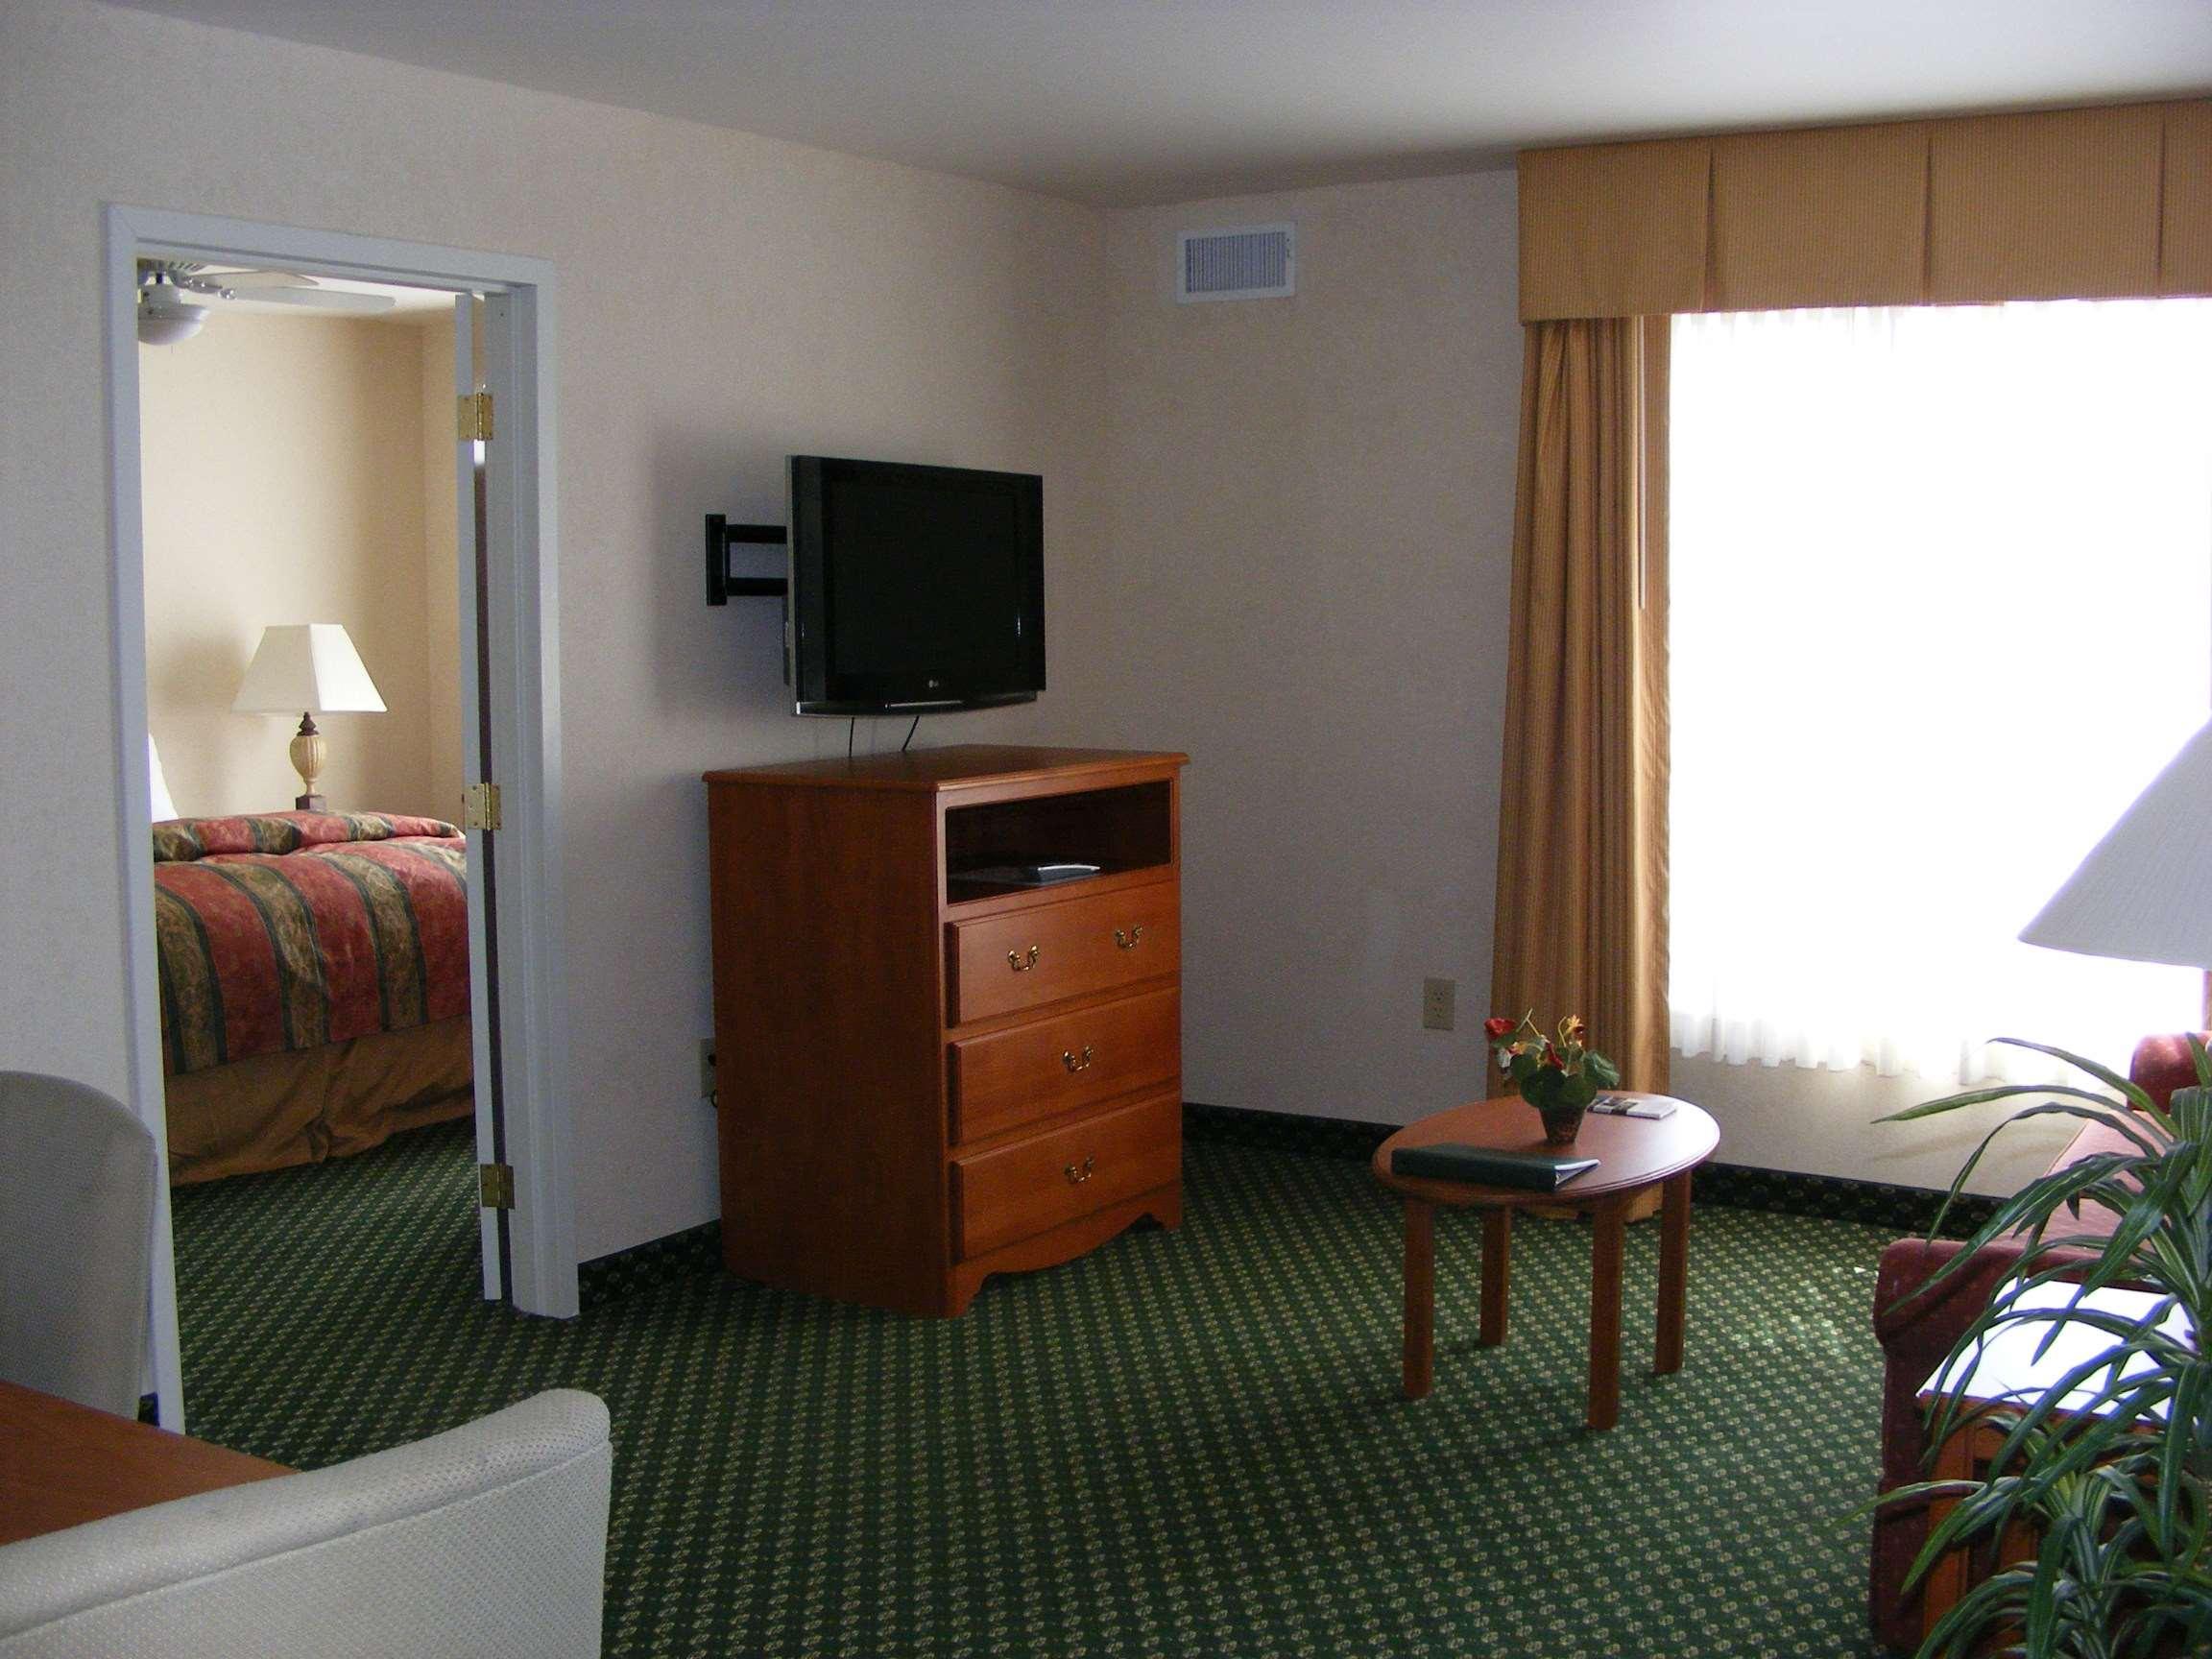 Homewood Suites by Hilton Philadelphia/Mt. Laurel image 6